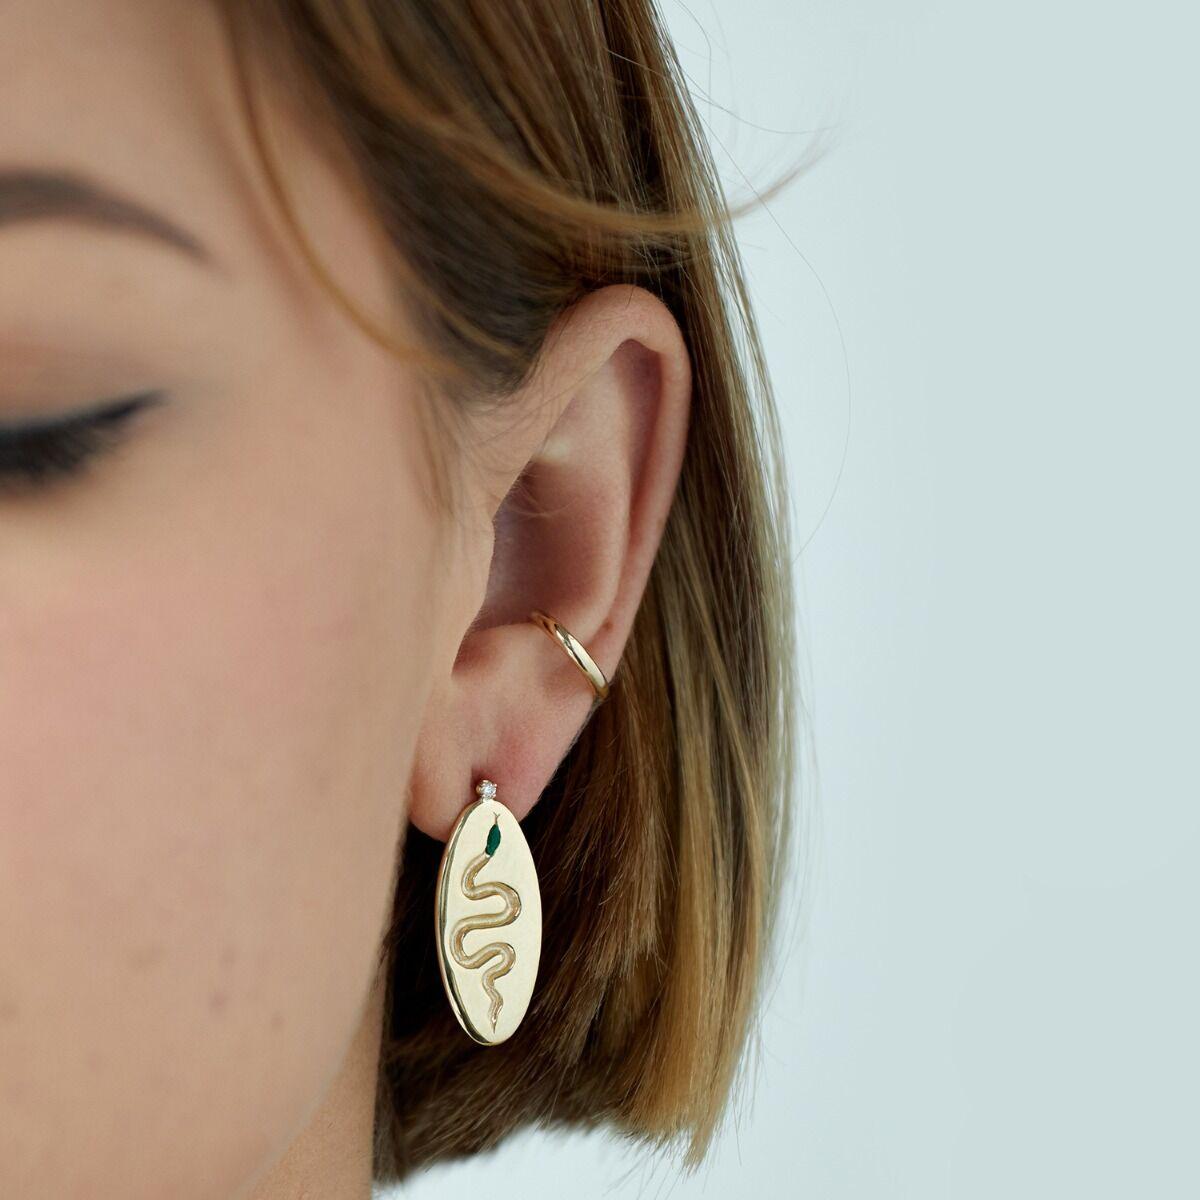 Serpent Coin Earrings (Pair) image